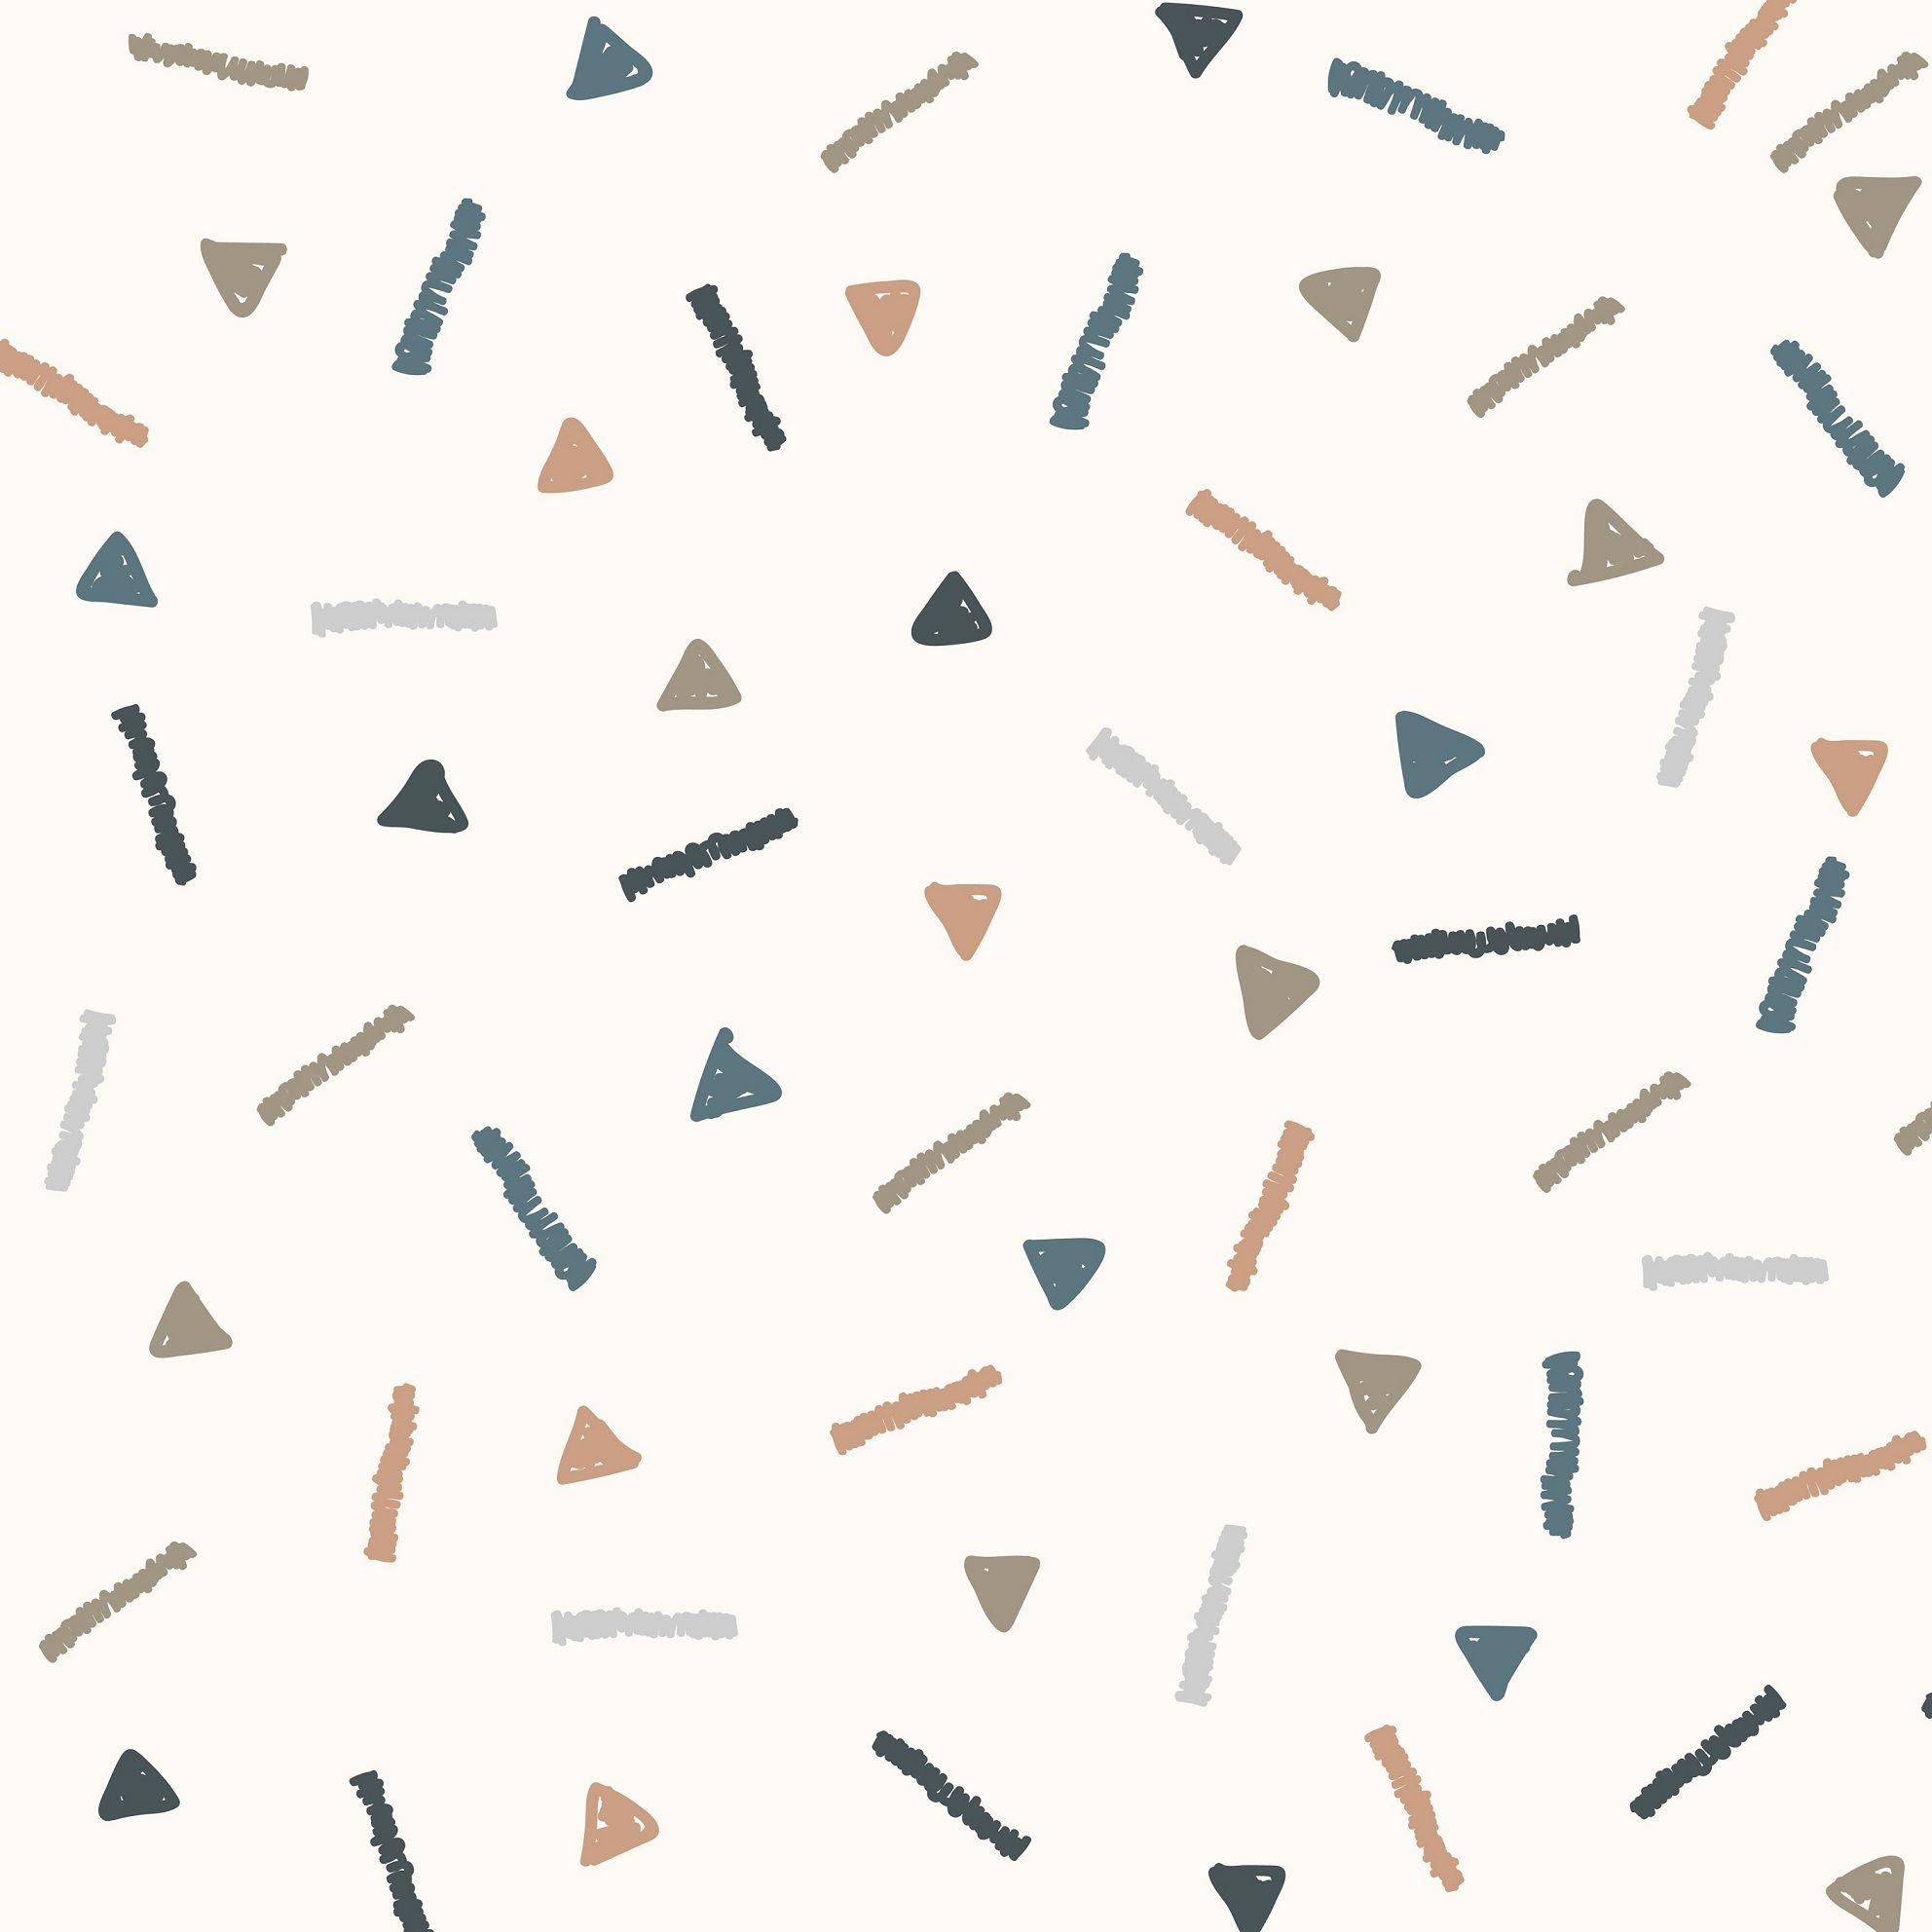 Papel de Parede ADESIVO - triângulos e riscos